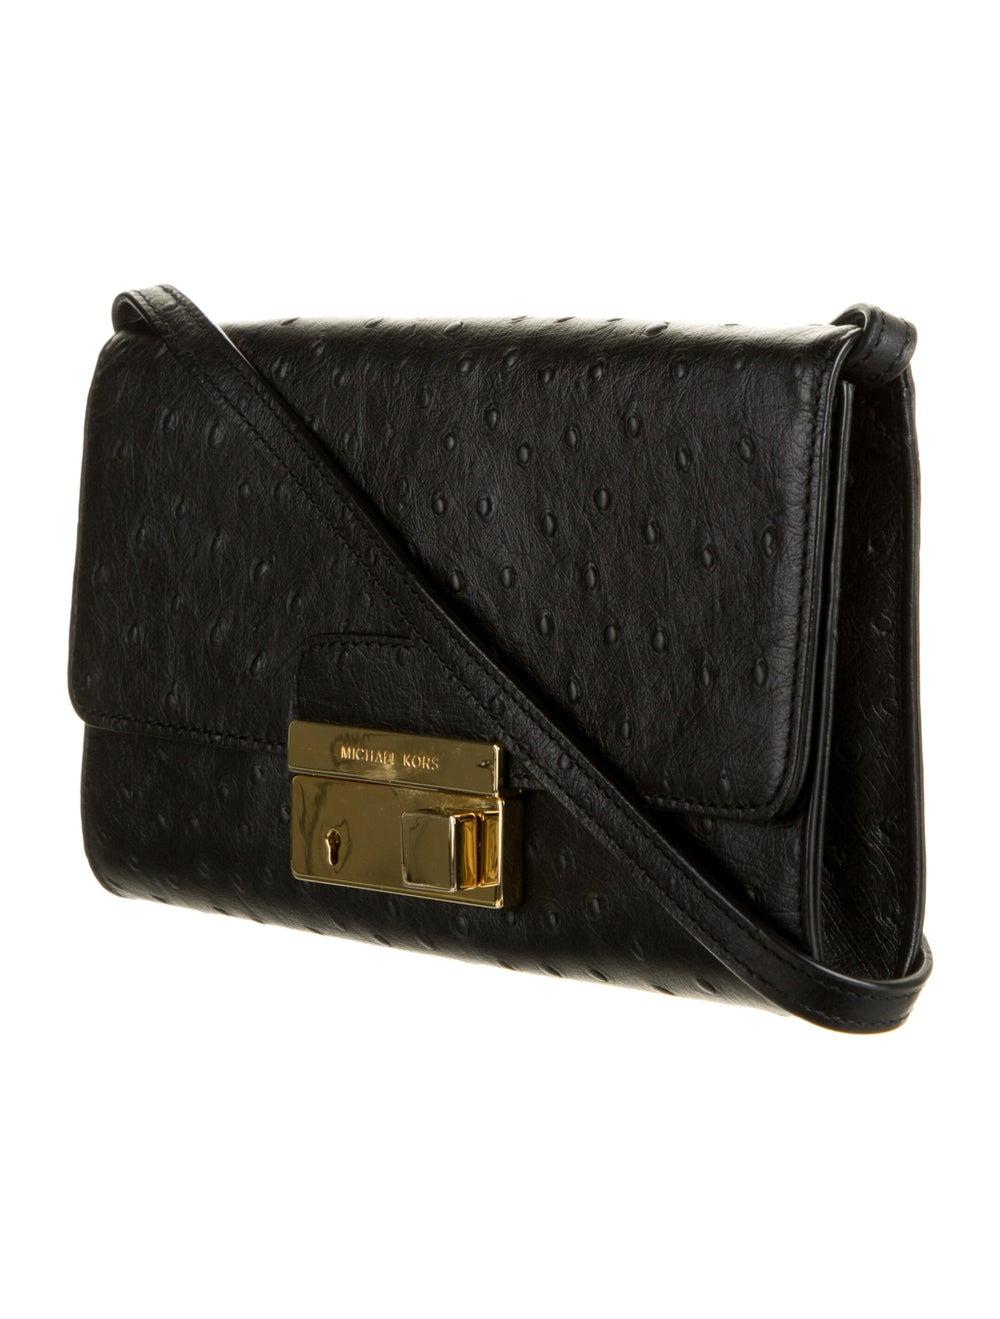 Michael Kors Embossed Leather Bag Black - image 3